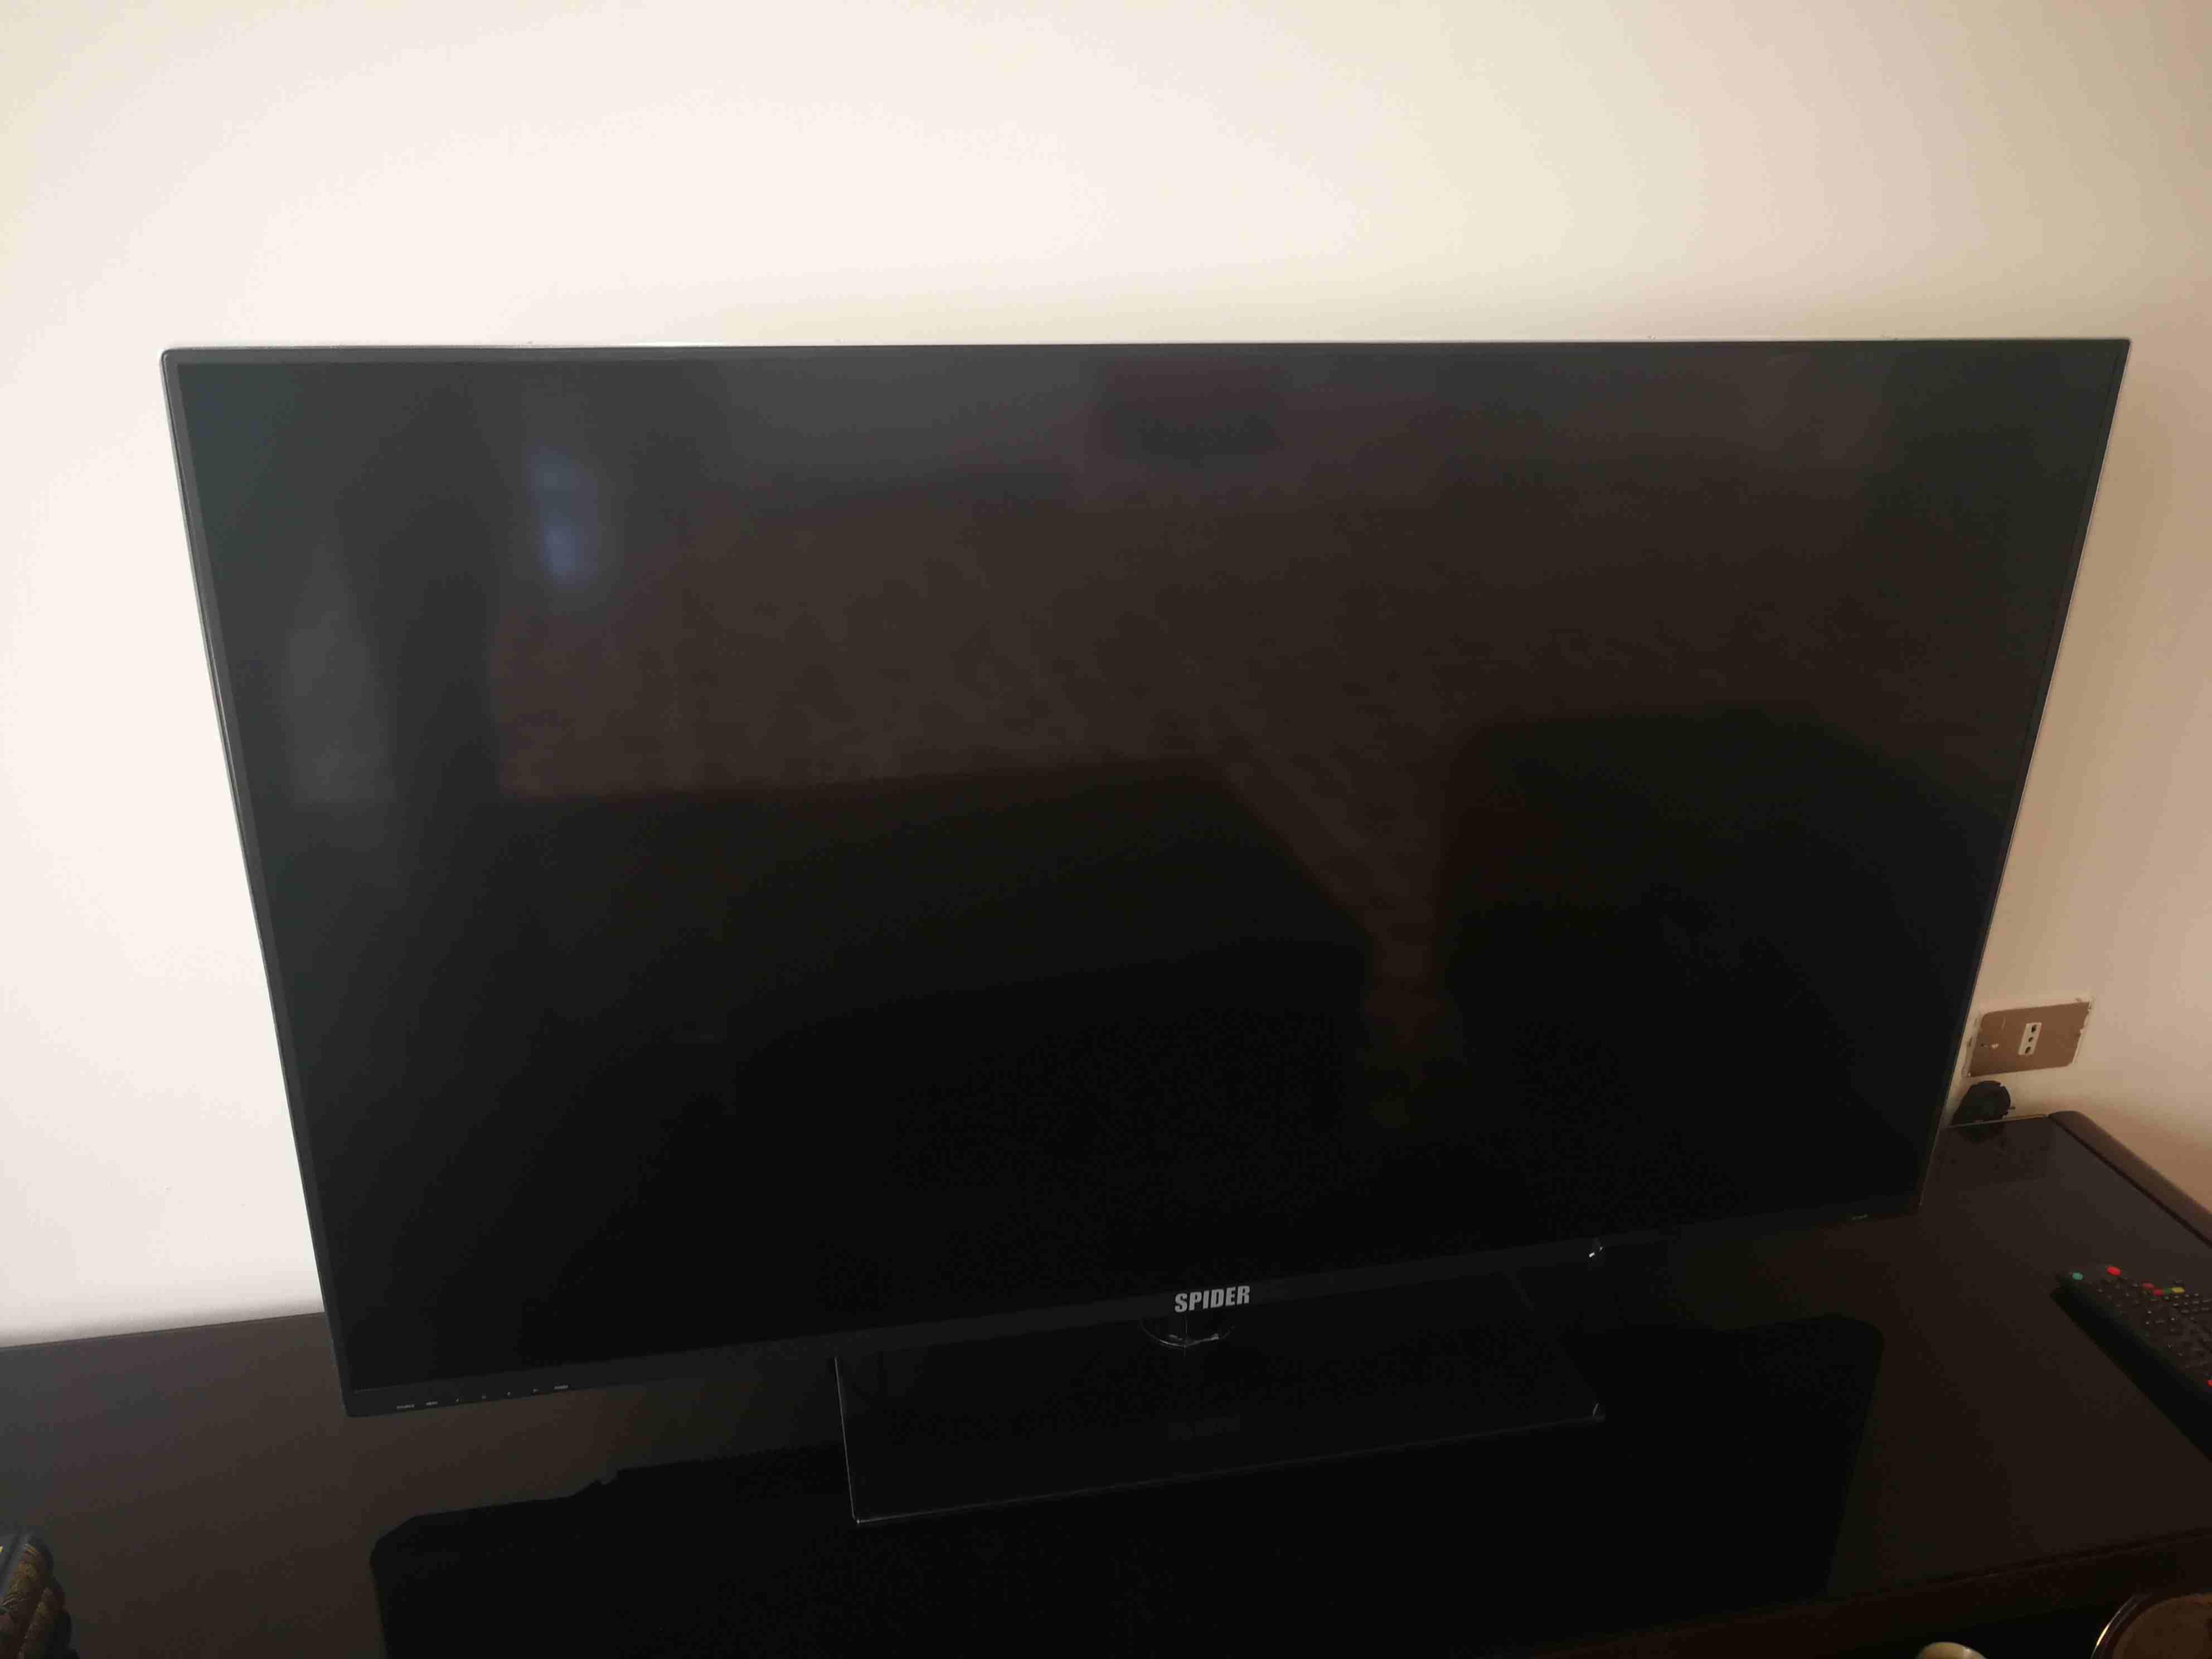 Samsung tv for sale perfect condition-  تلفزيون سبايدر ٥٠ بوصه...